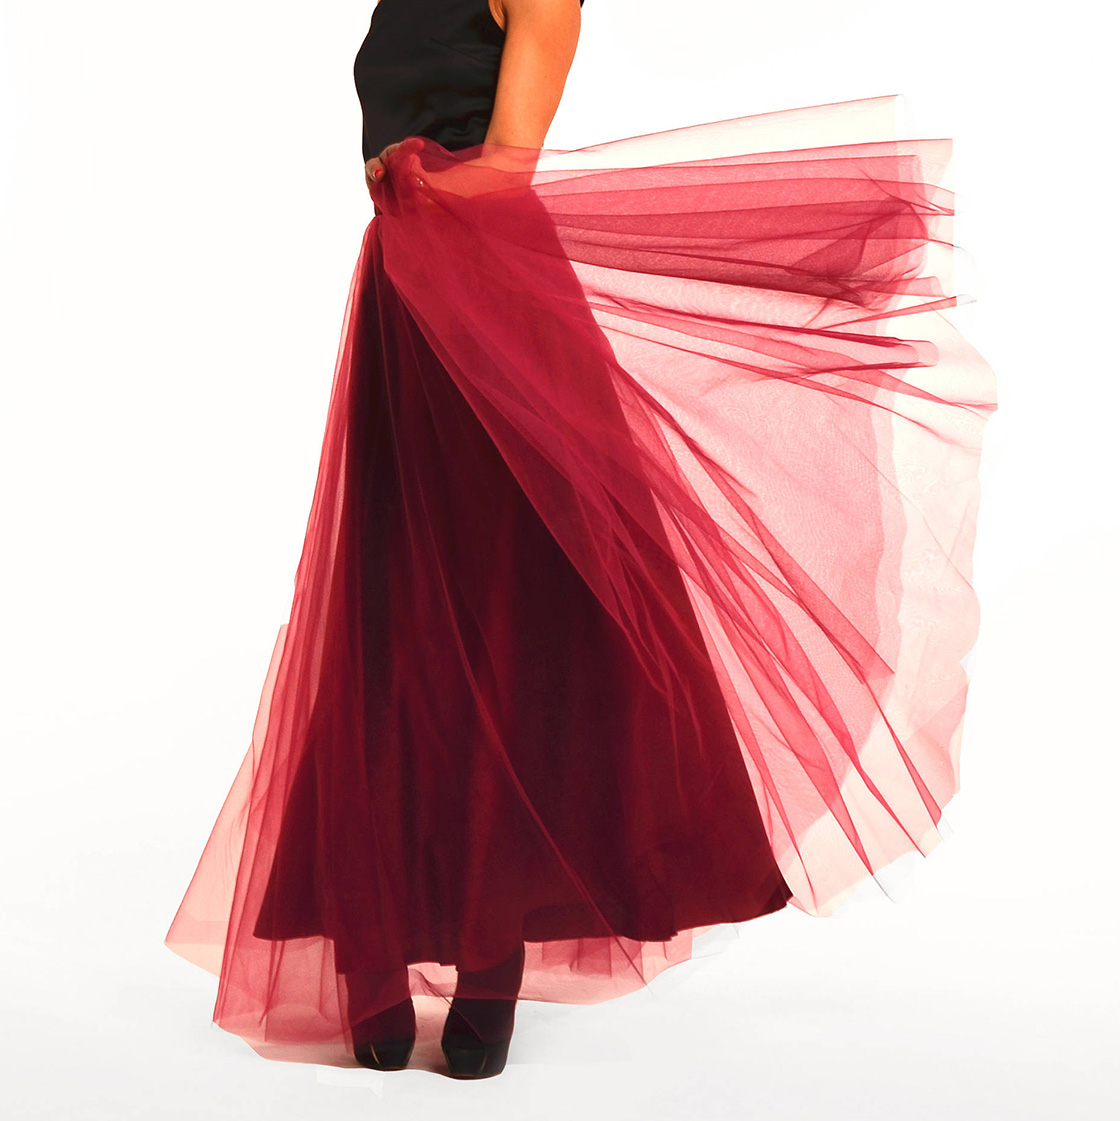 Custom Graceful Long Tulle Skirts 5 Layers Wine Red Soft Secret Bridesmaid Skirts Vintage Floor Length Wedding Party Skirt